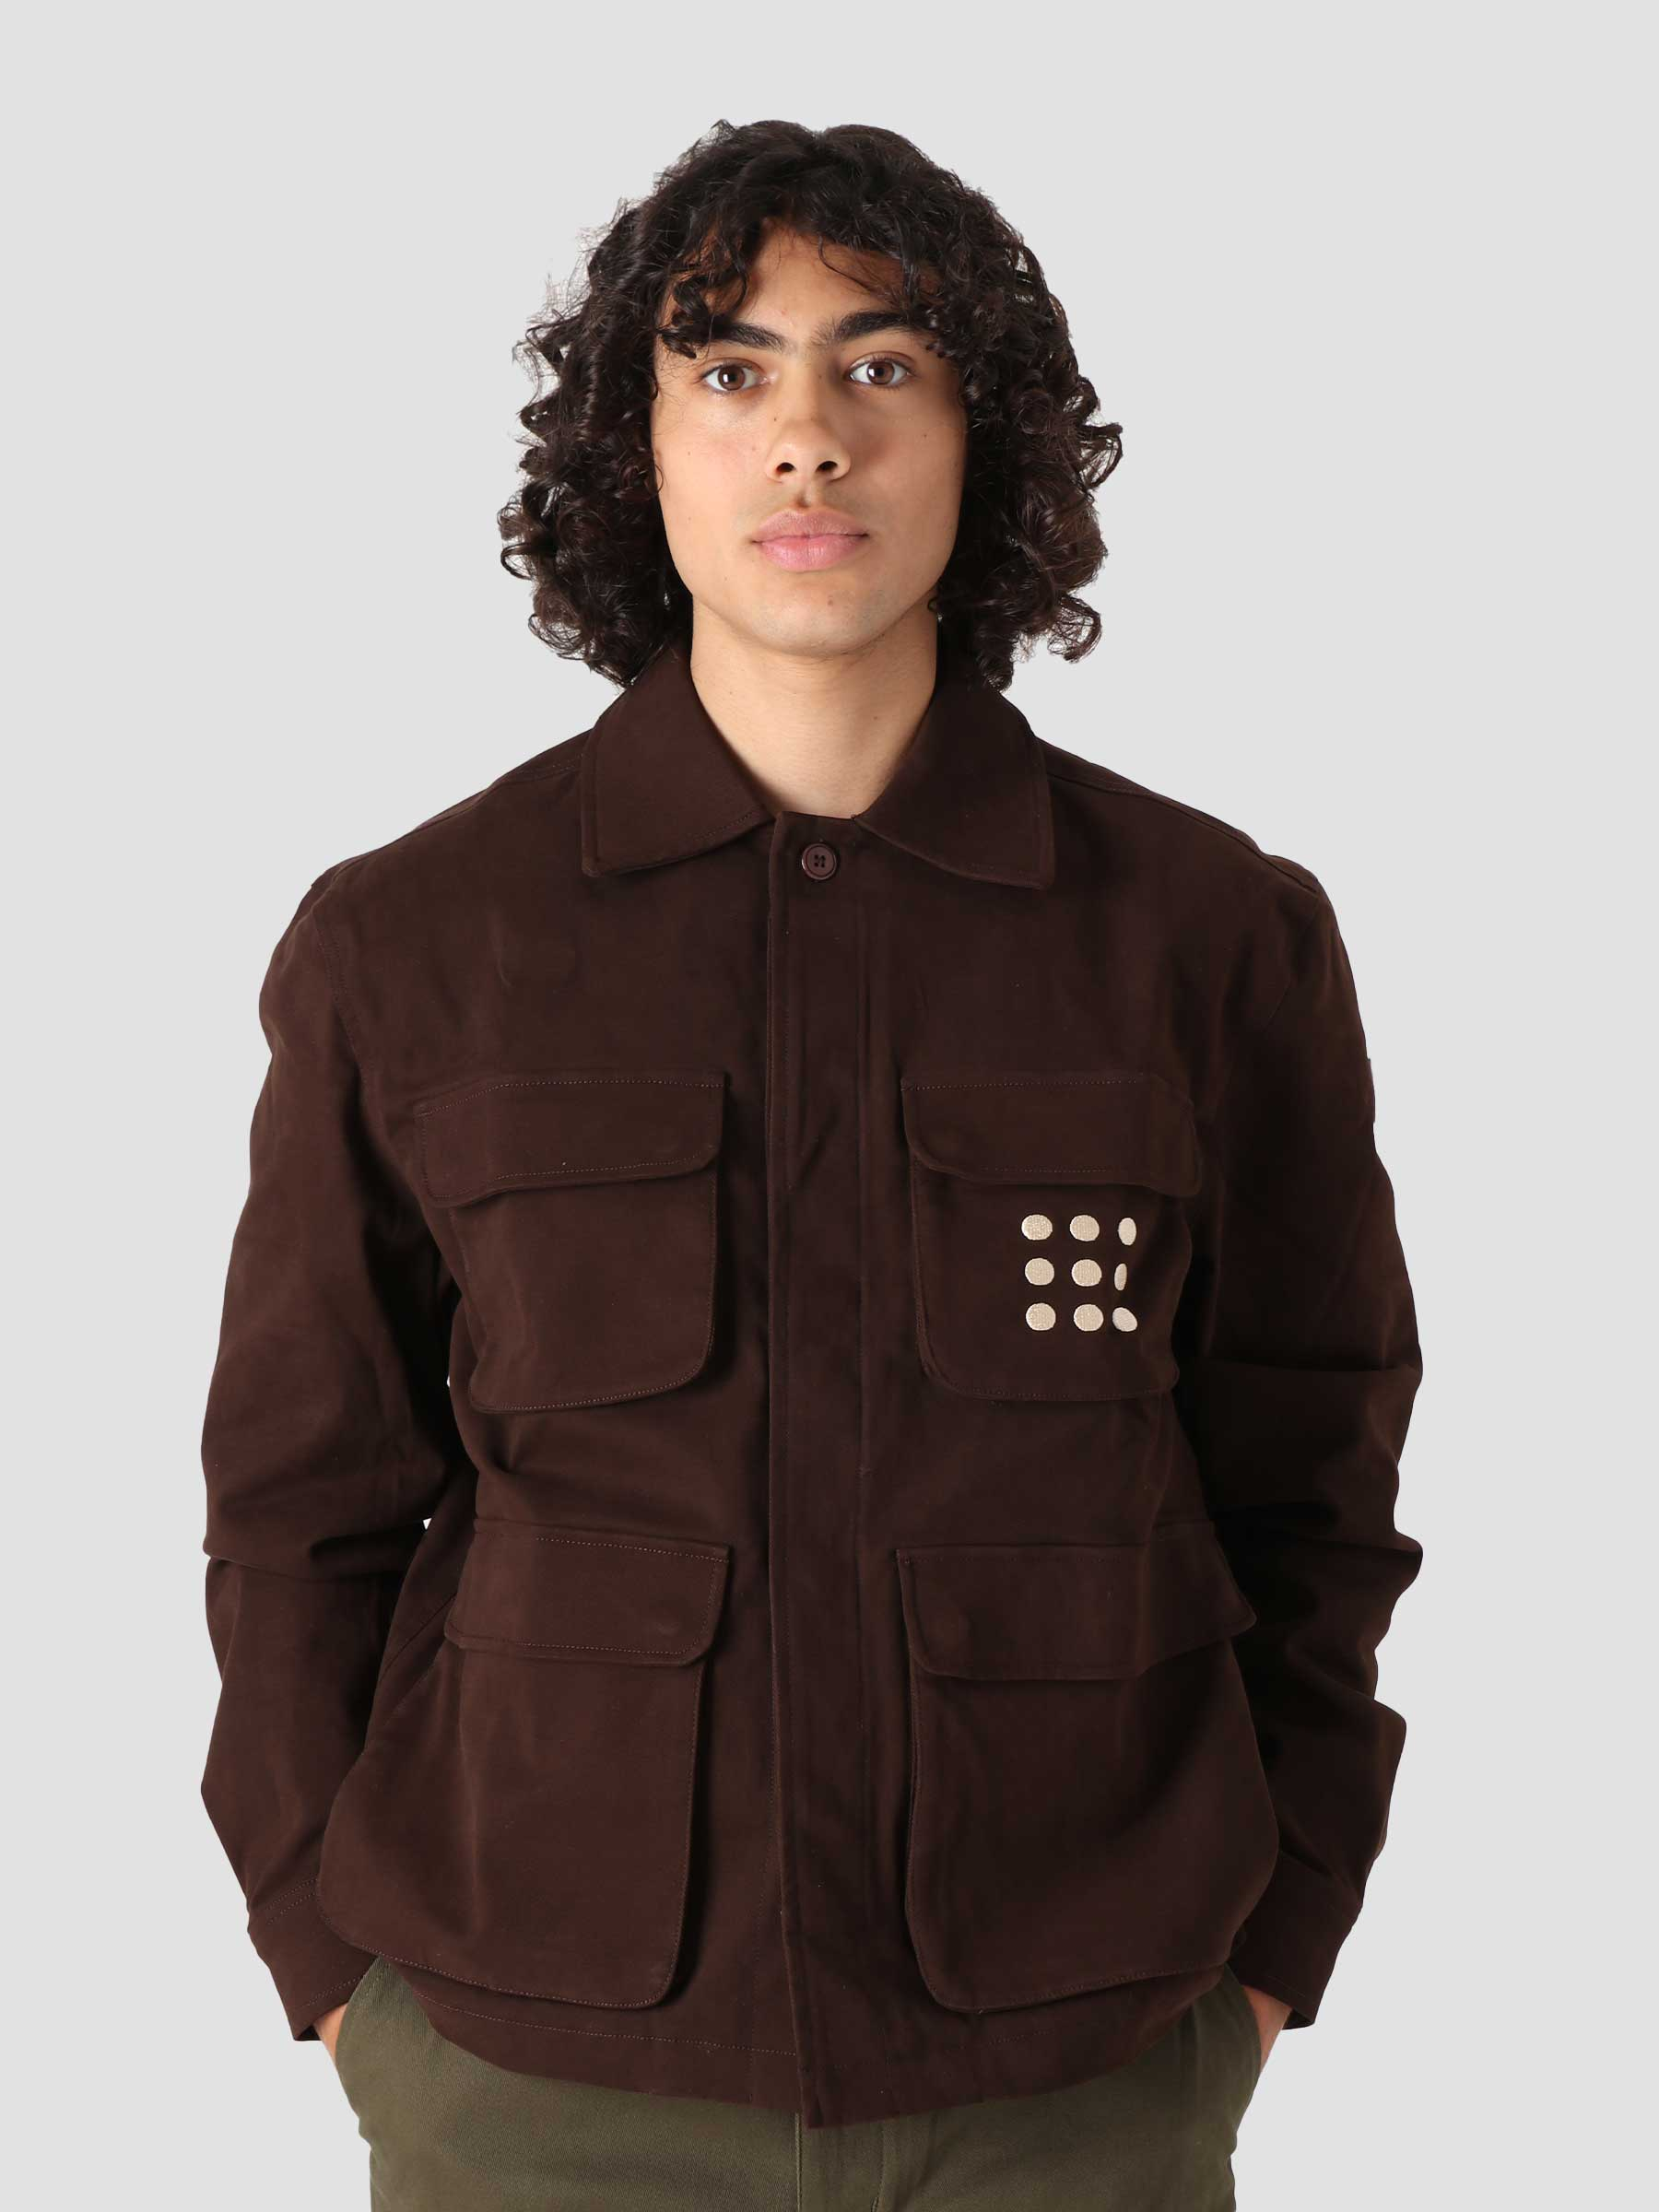 Multipocket Jacket Chocolate TNO.211.9D.401.802